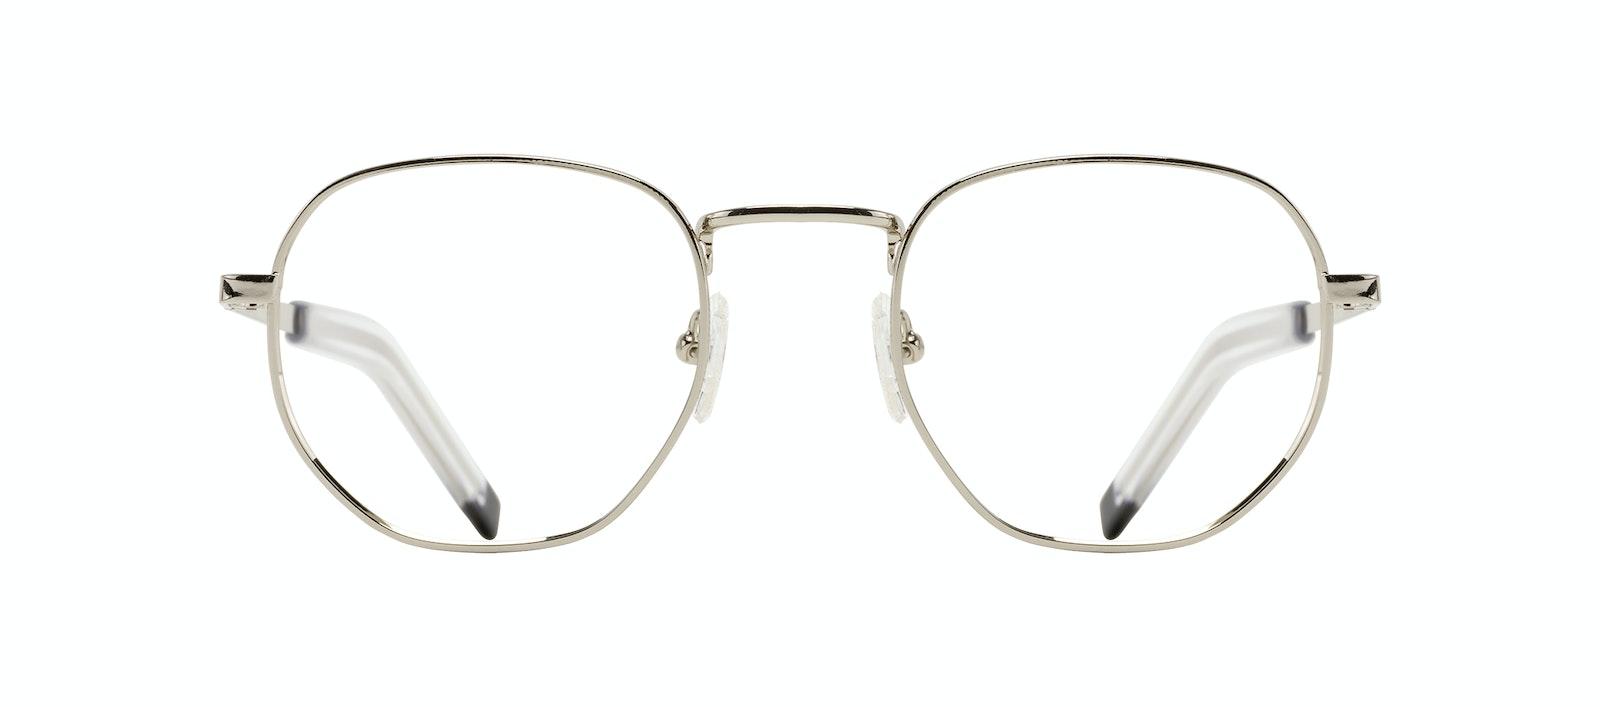 Affordable Fashion Glasses Round Eyeglasses Men Rise Silver Front